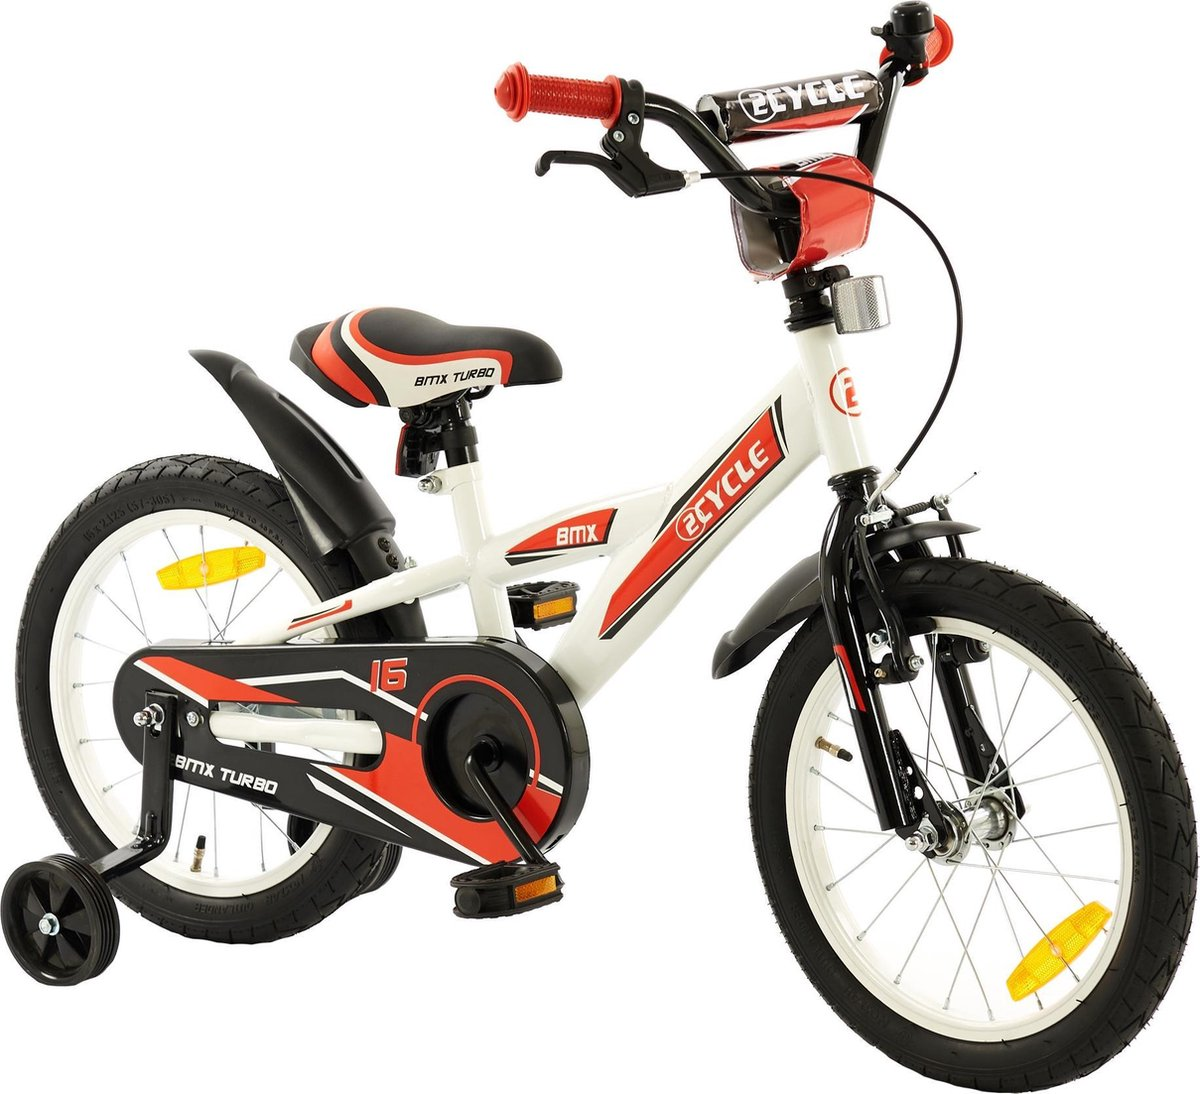 2Cycle BMX Kinderfiets - 16 inch - Wit-Rood - Jongensfiets